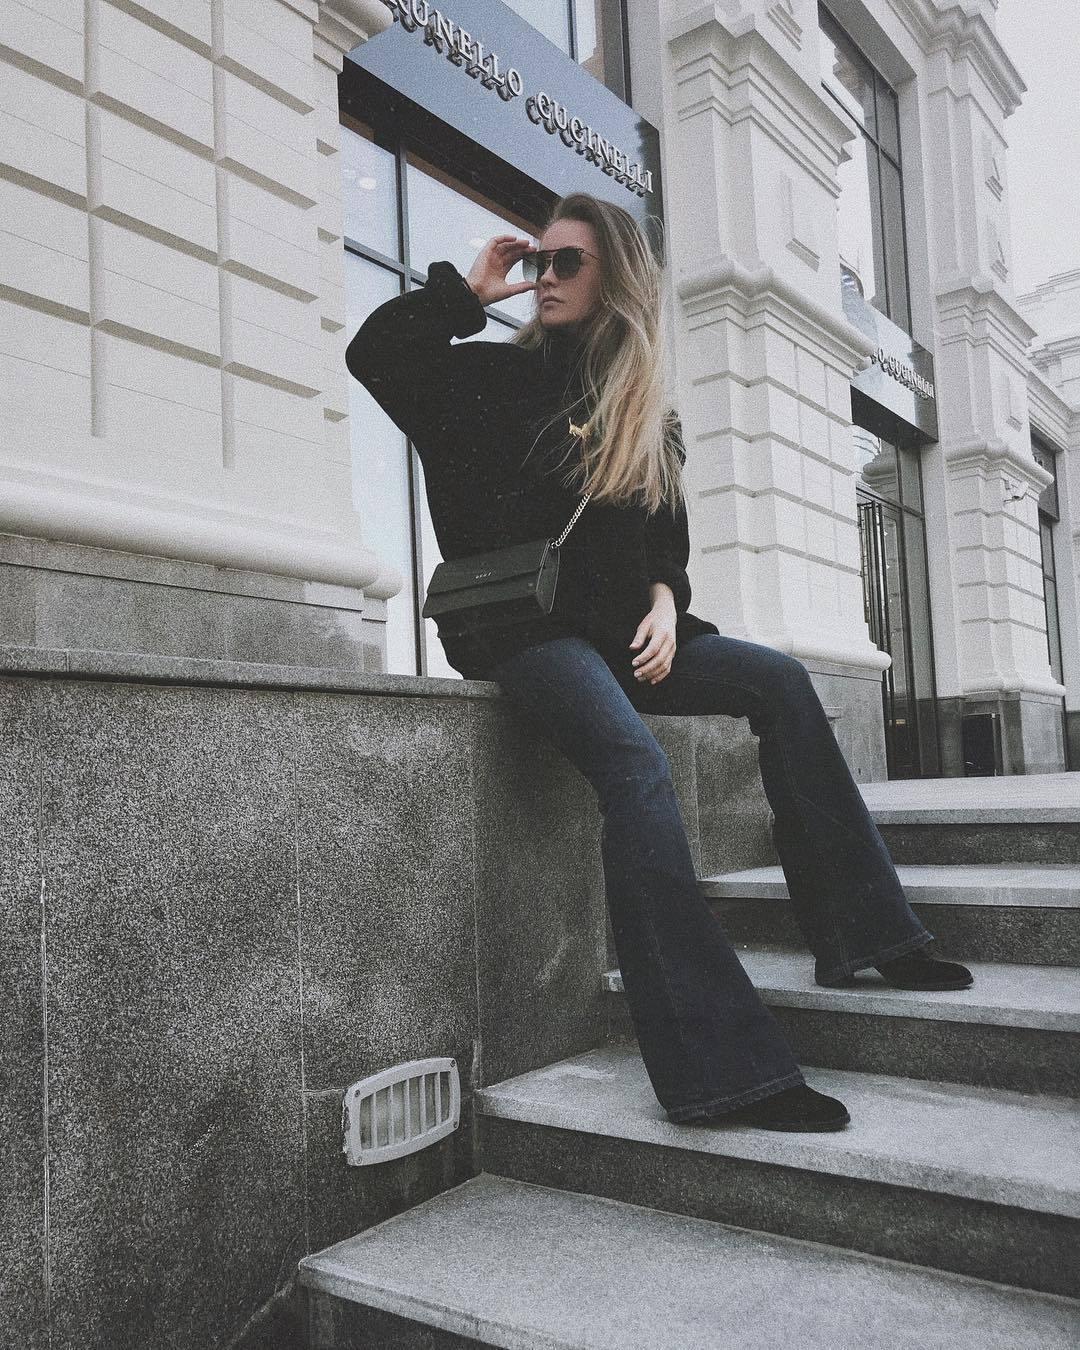 I9xs71r: Olga Chocolate / Olga Katysheva NEXT: